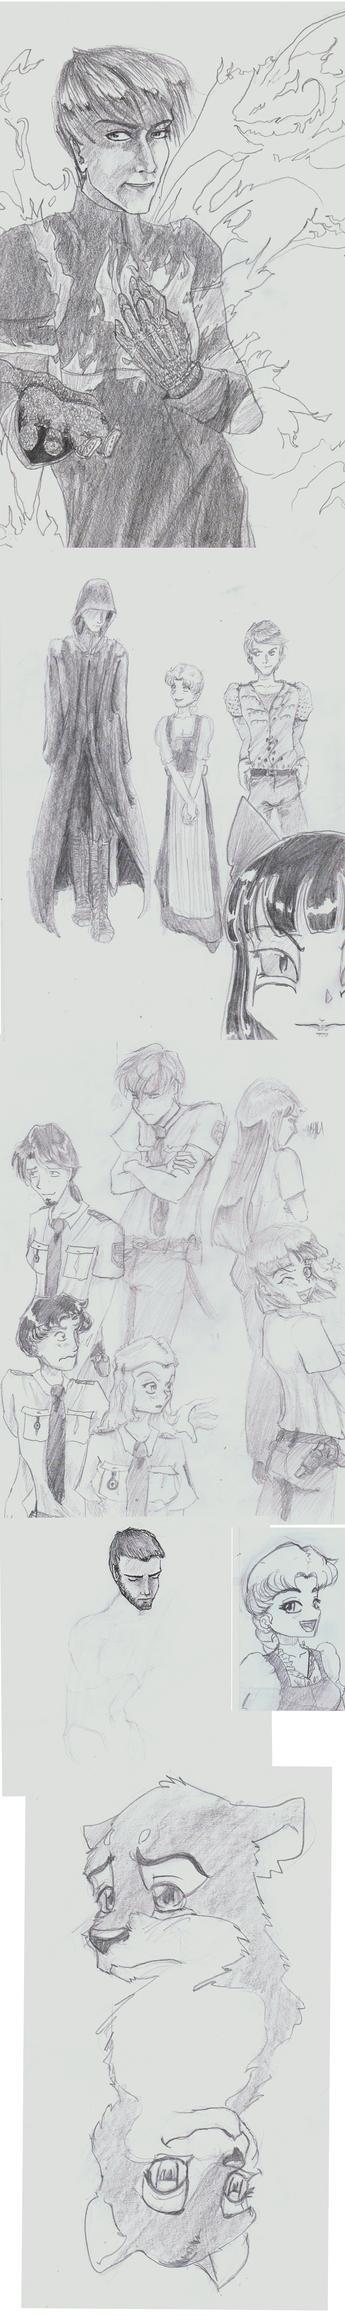 sketch dump2015 03 21 by Sevel